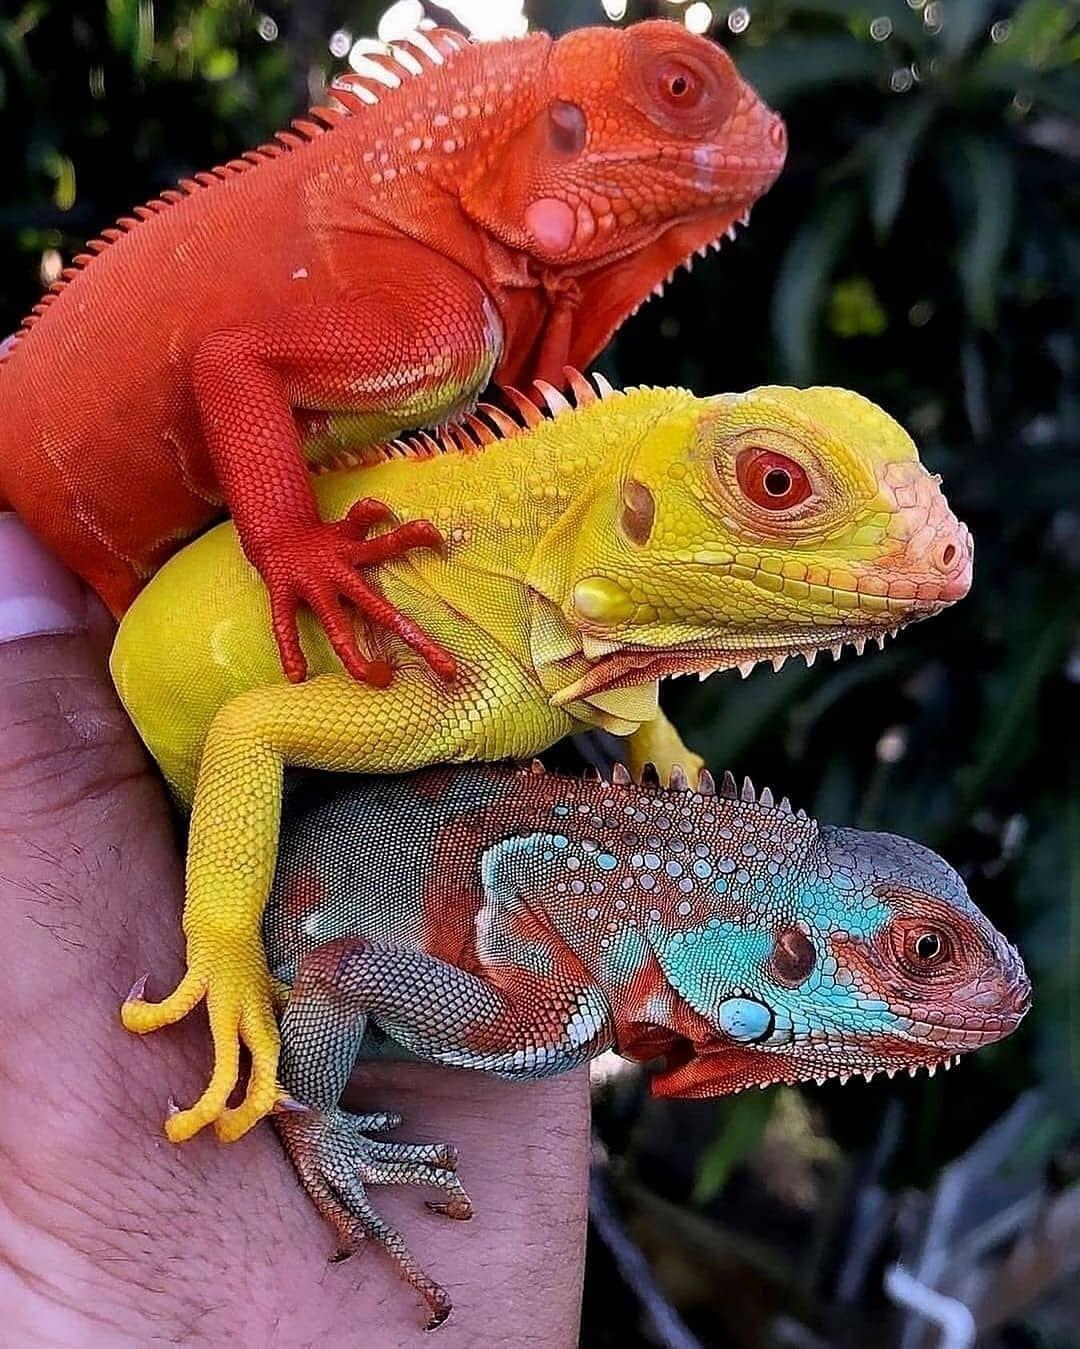 Photo By Animais Exoticos Animais Bebes Mais Fofos Animais